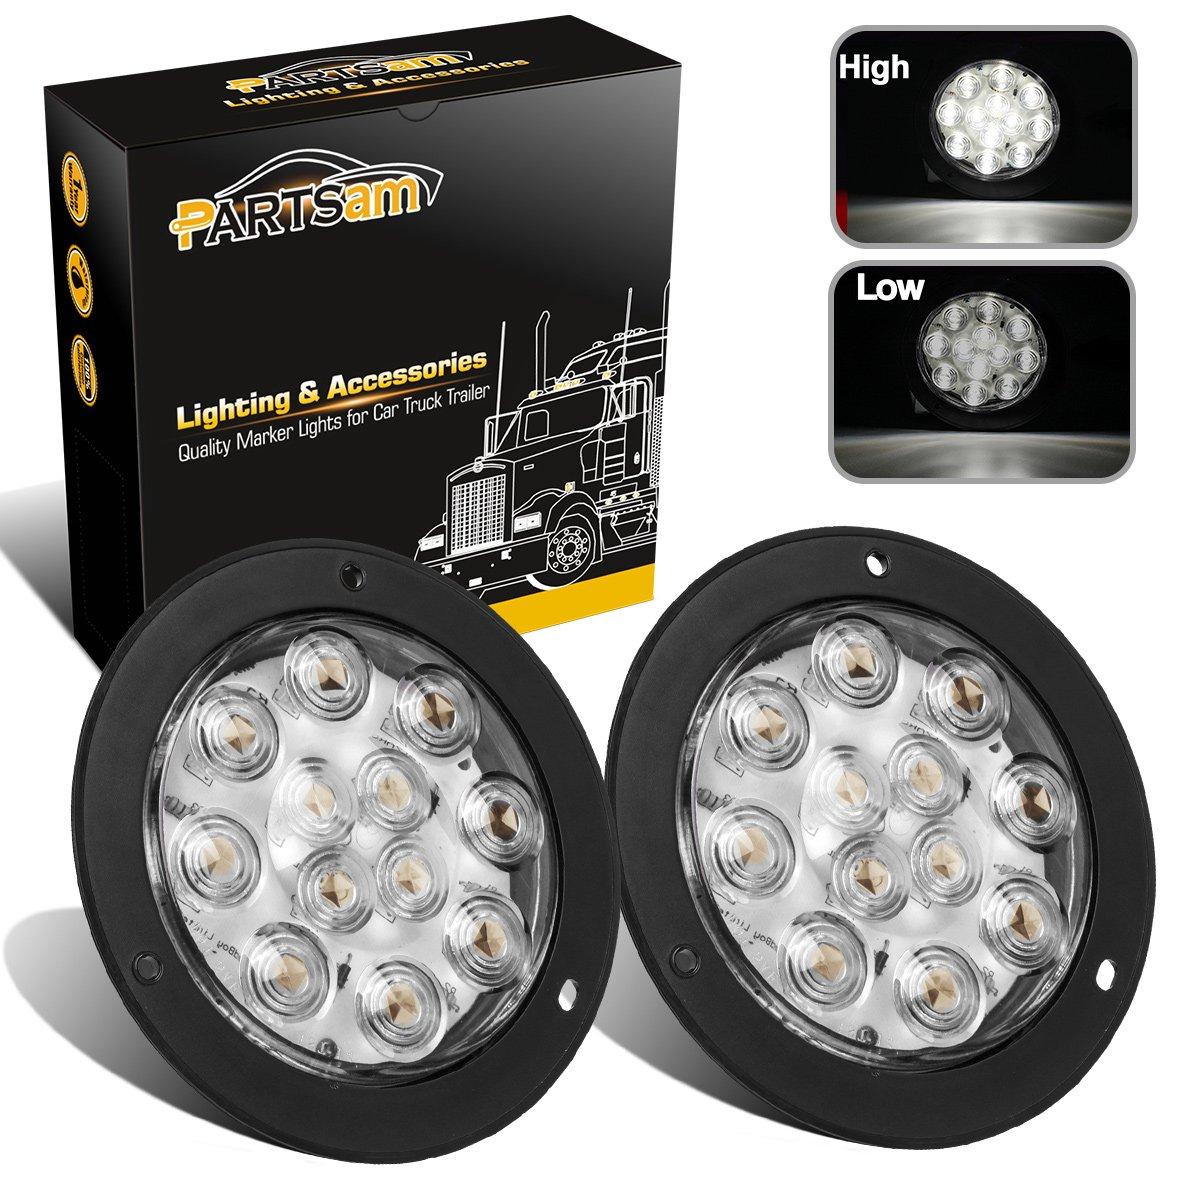 "Amazon.com: Partsam 2PCS 4"" Waterproof Backup Reverse light Flange Mount 12  LED Truck Trailer RV White: Automotive"